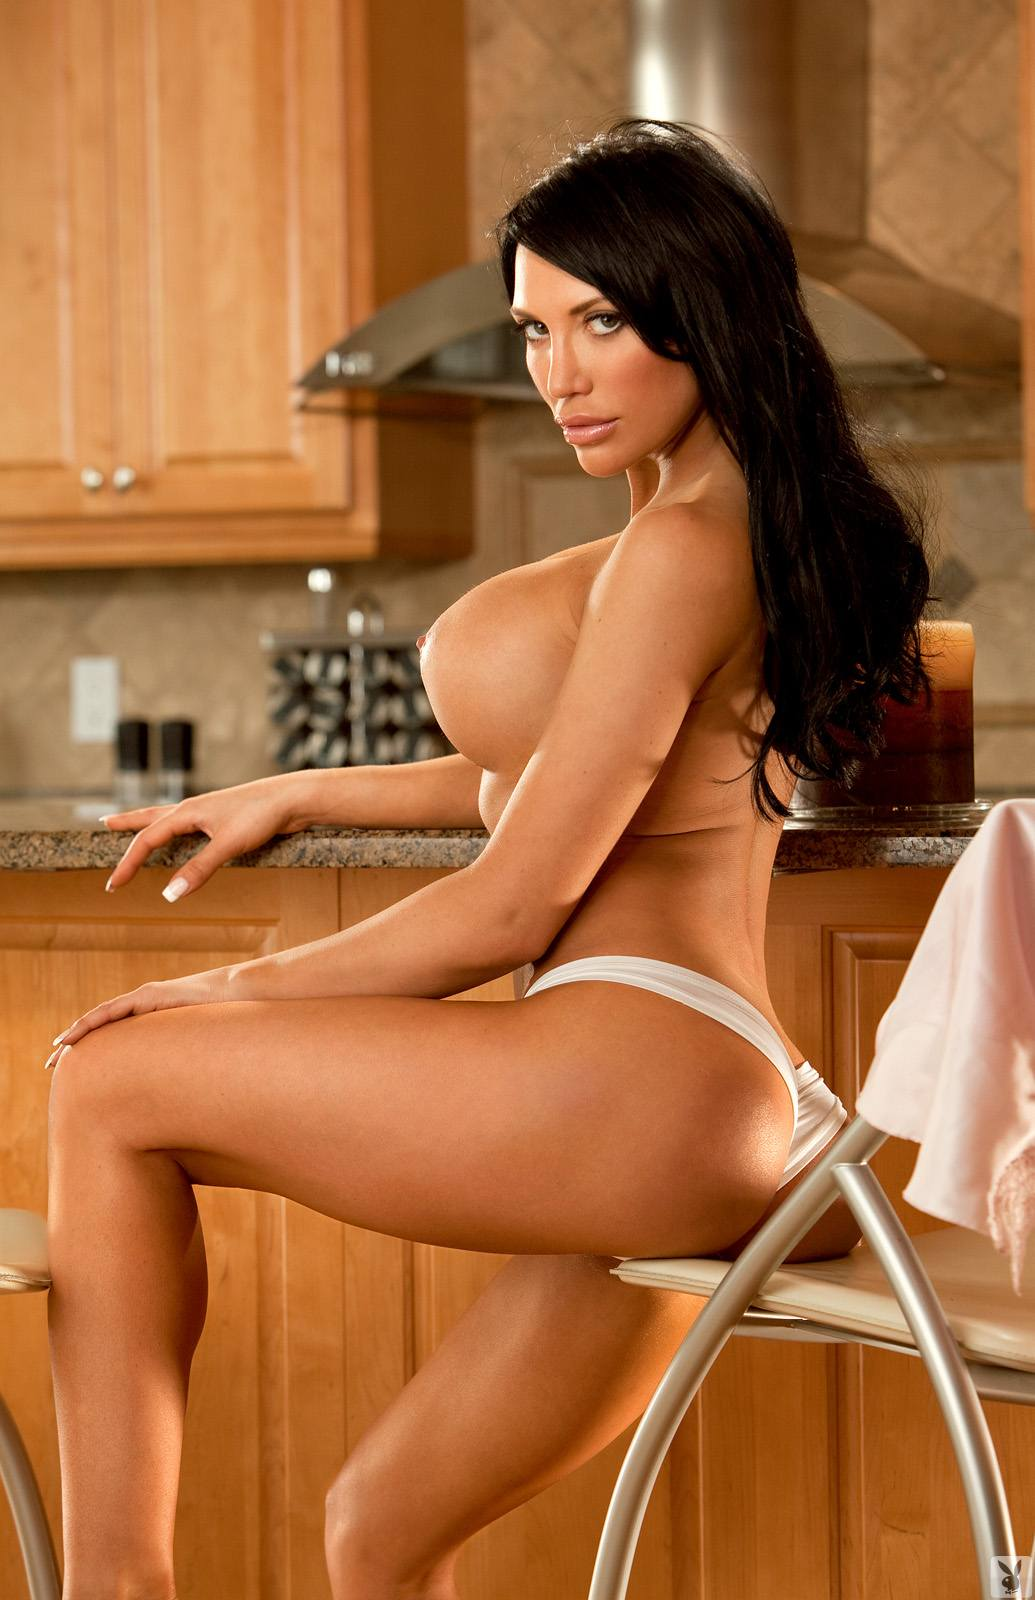 Lana dealessi nude